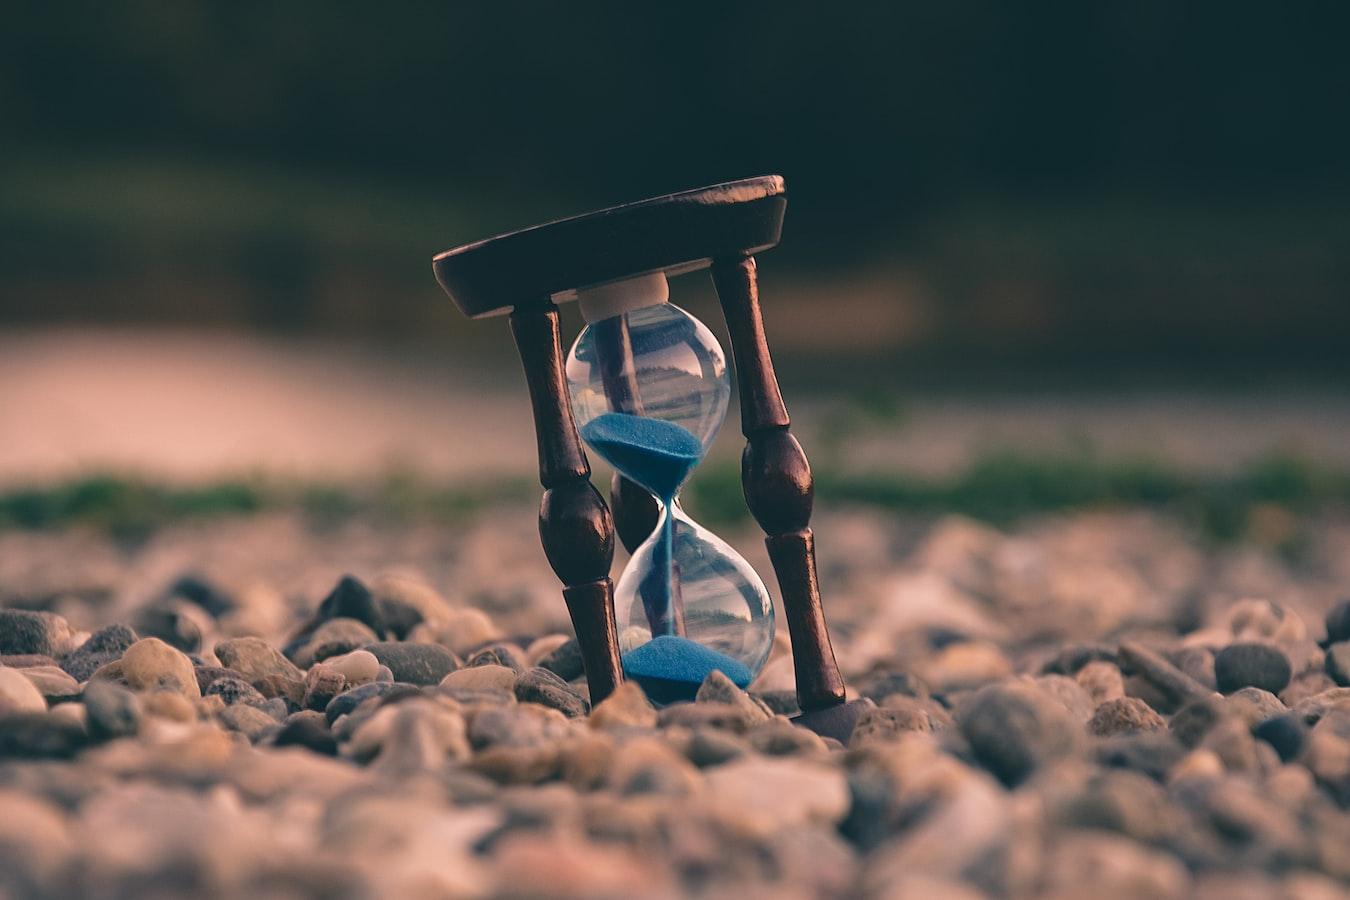 affiliate marketing takes time to realize revenue